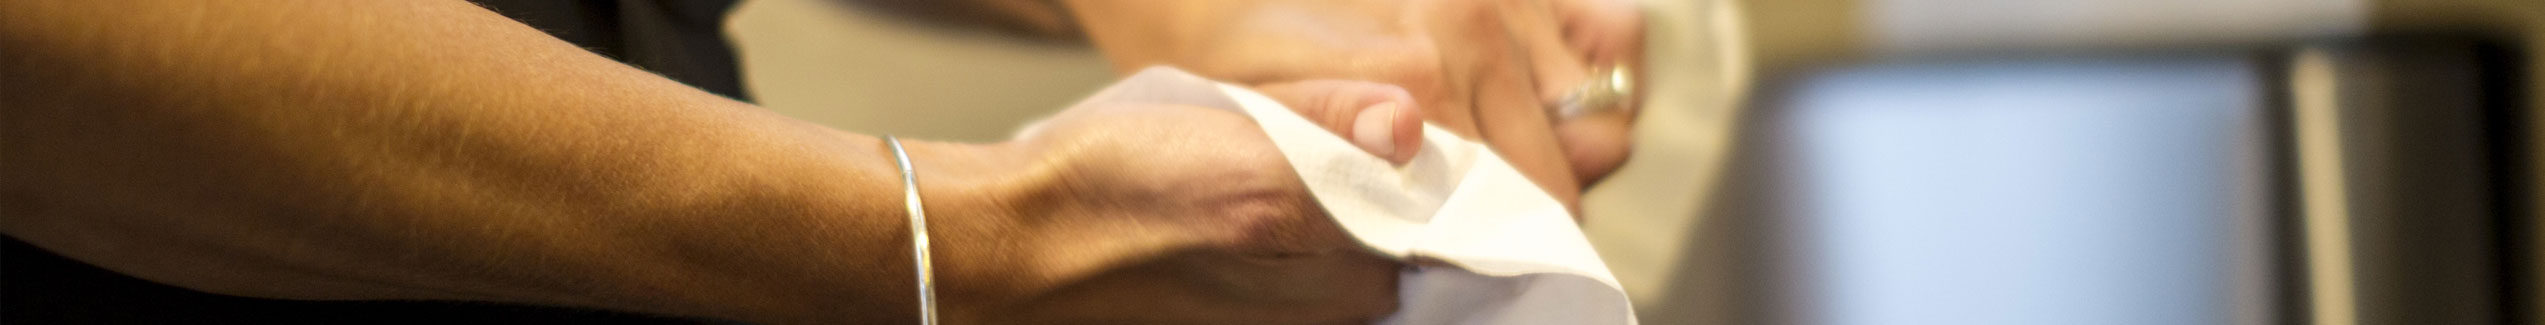 avanti-hand-drying-image